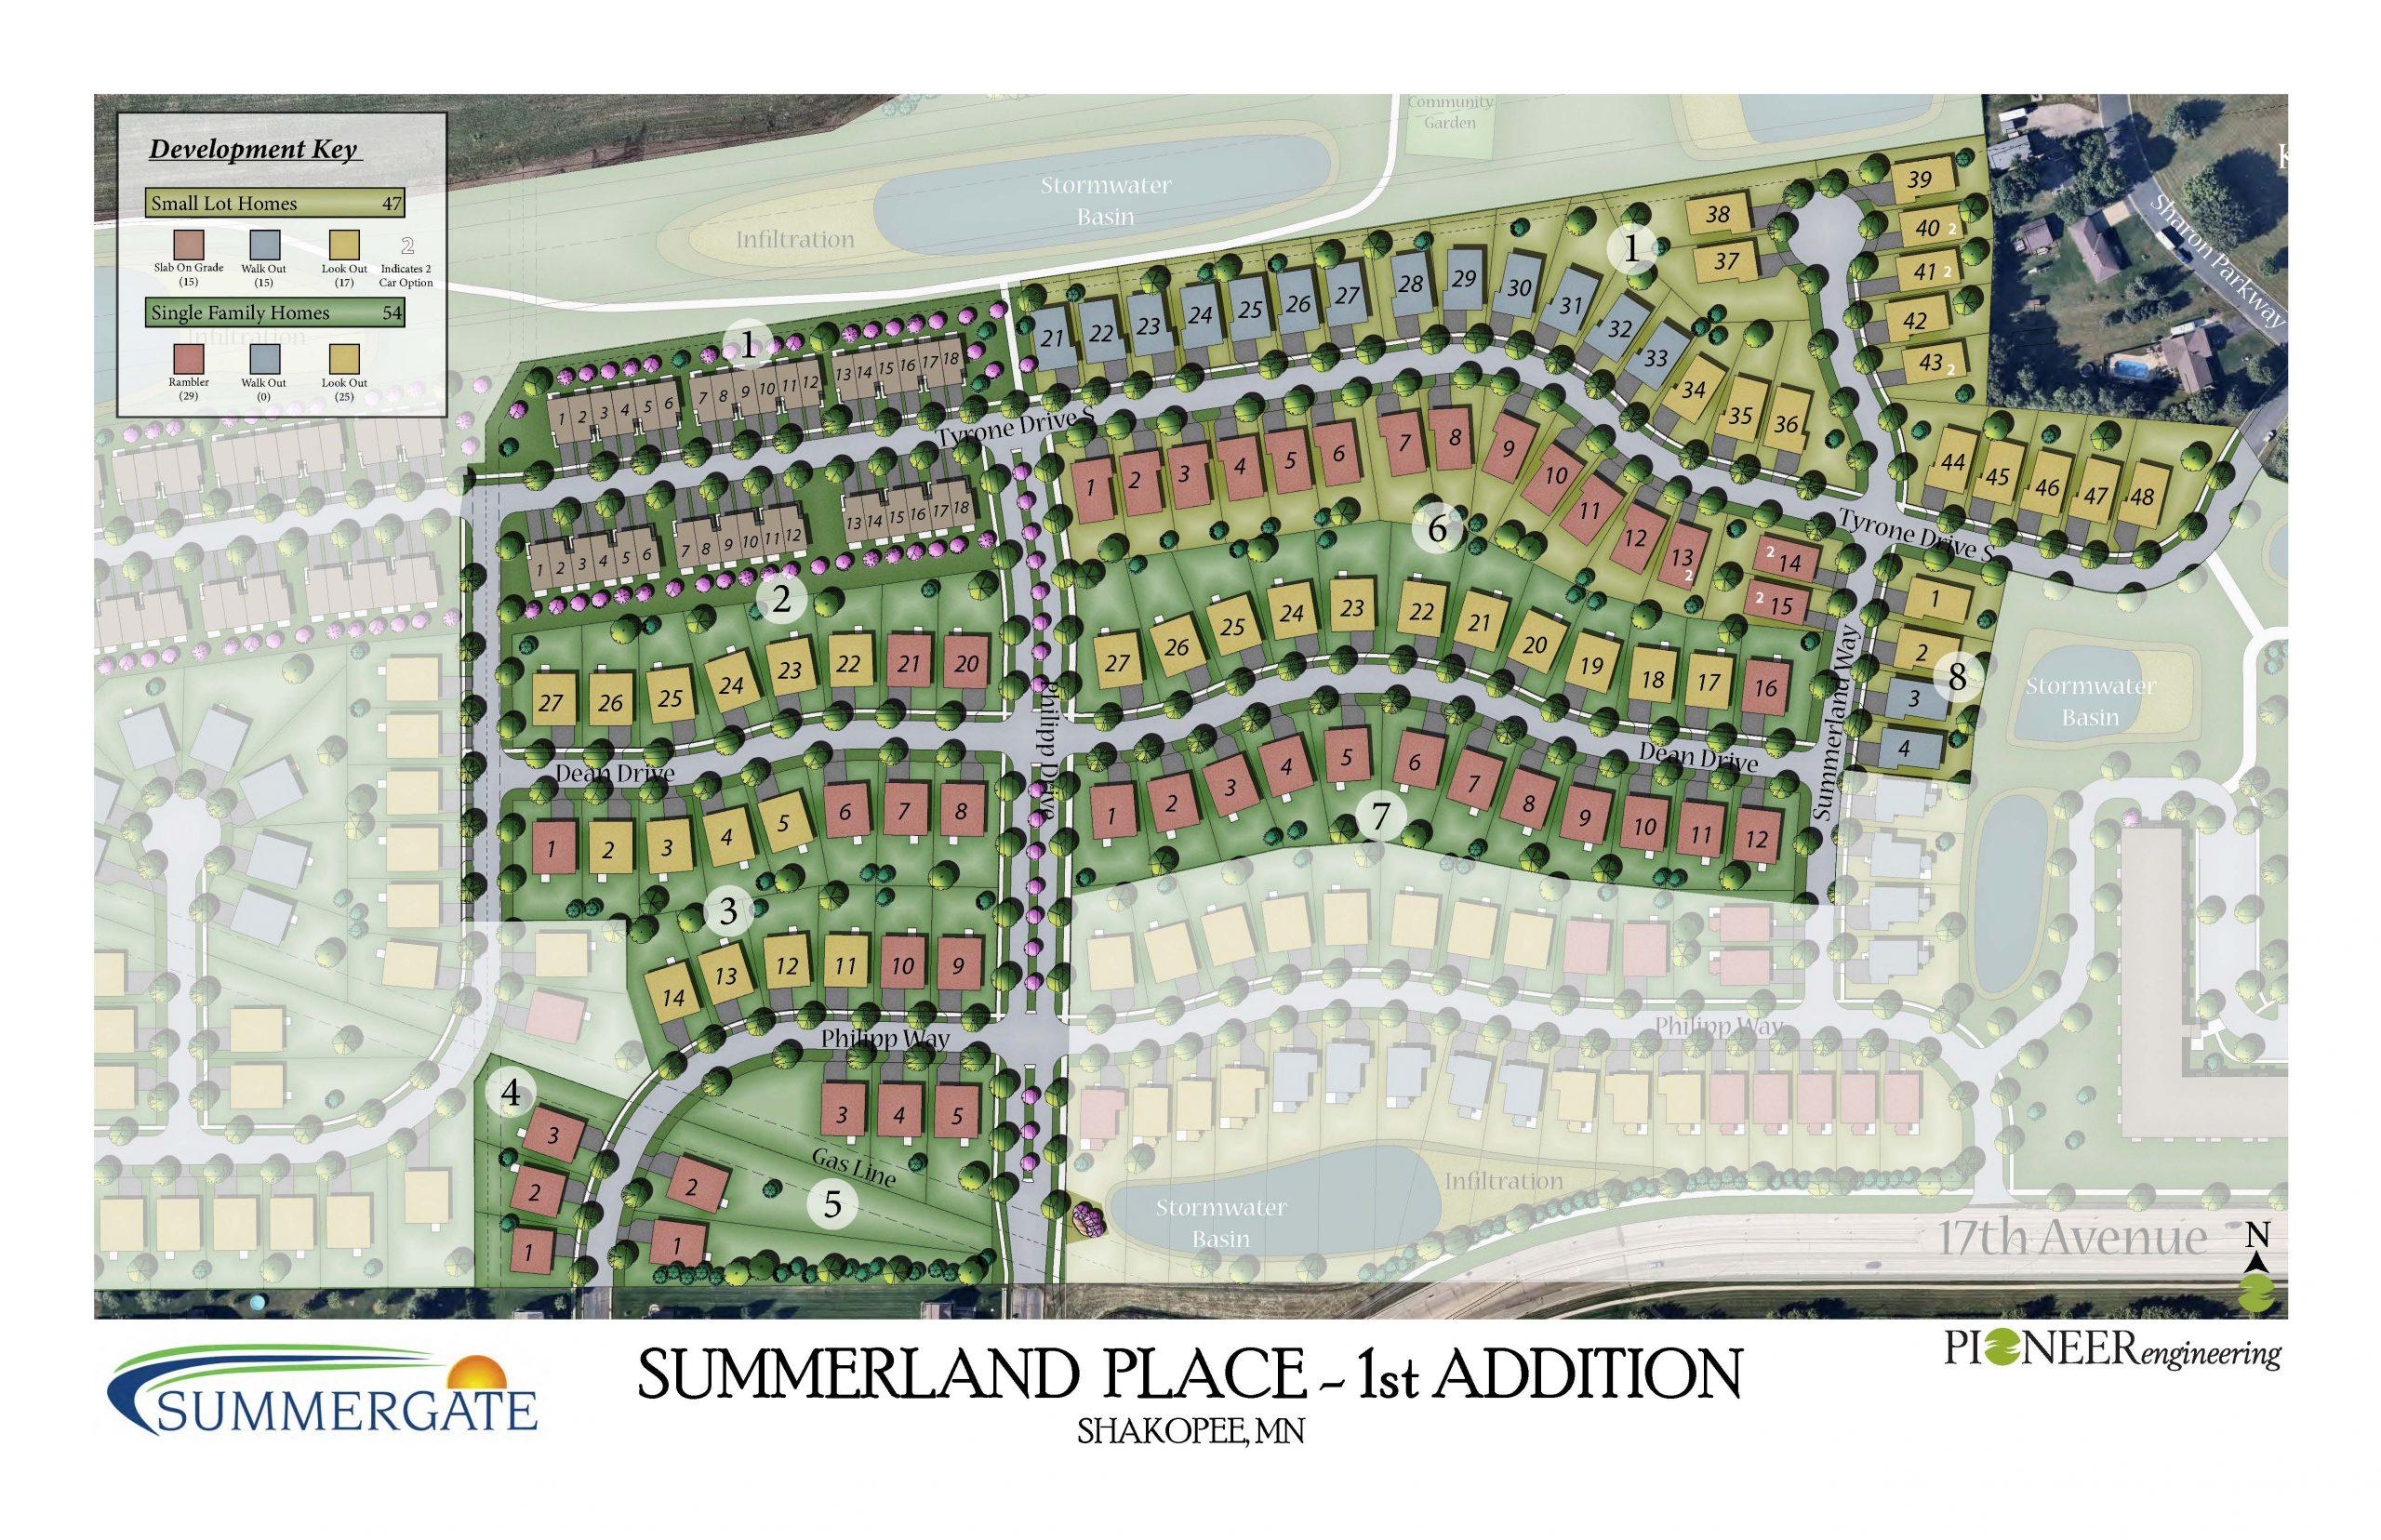 119035 2 21 Summerland Place Renderingsm (3)